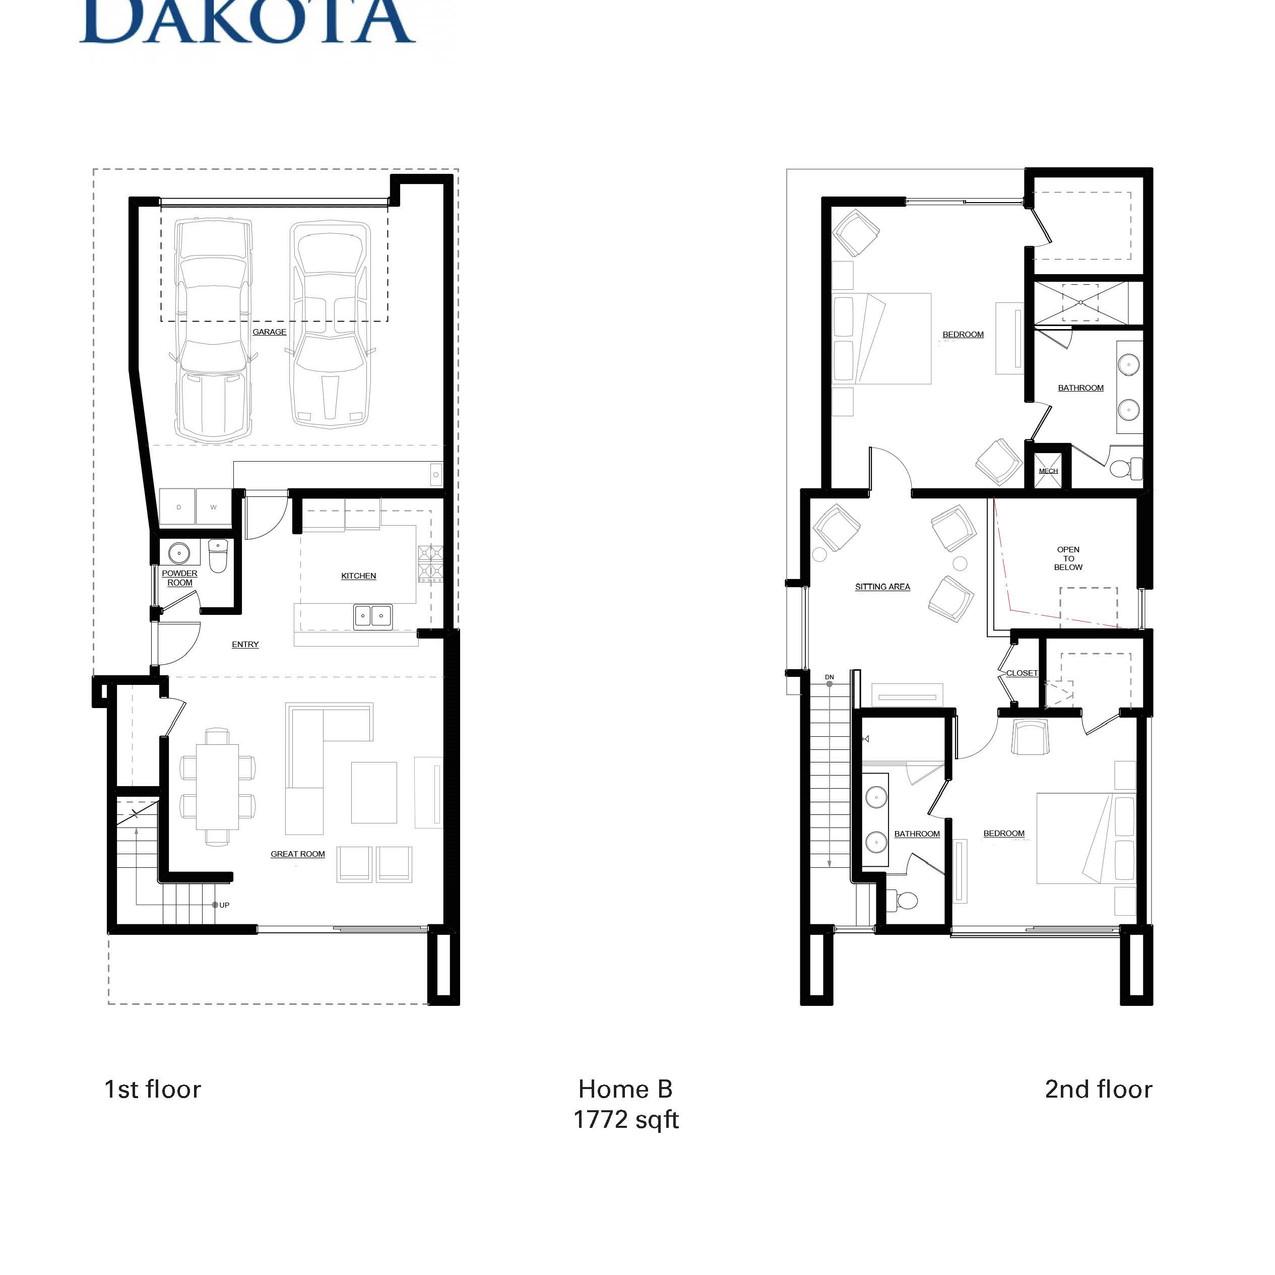 Dakota-Floor-Plans_Phase1-Home B_Page_2